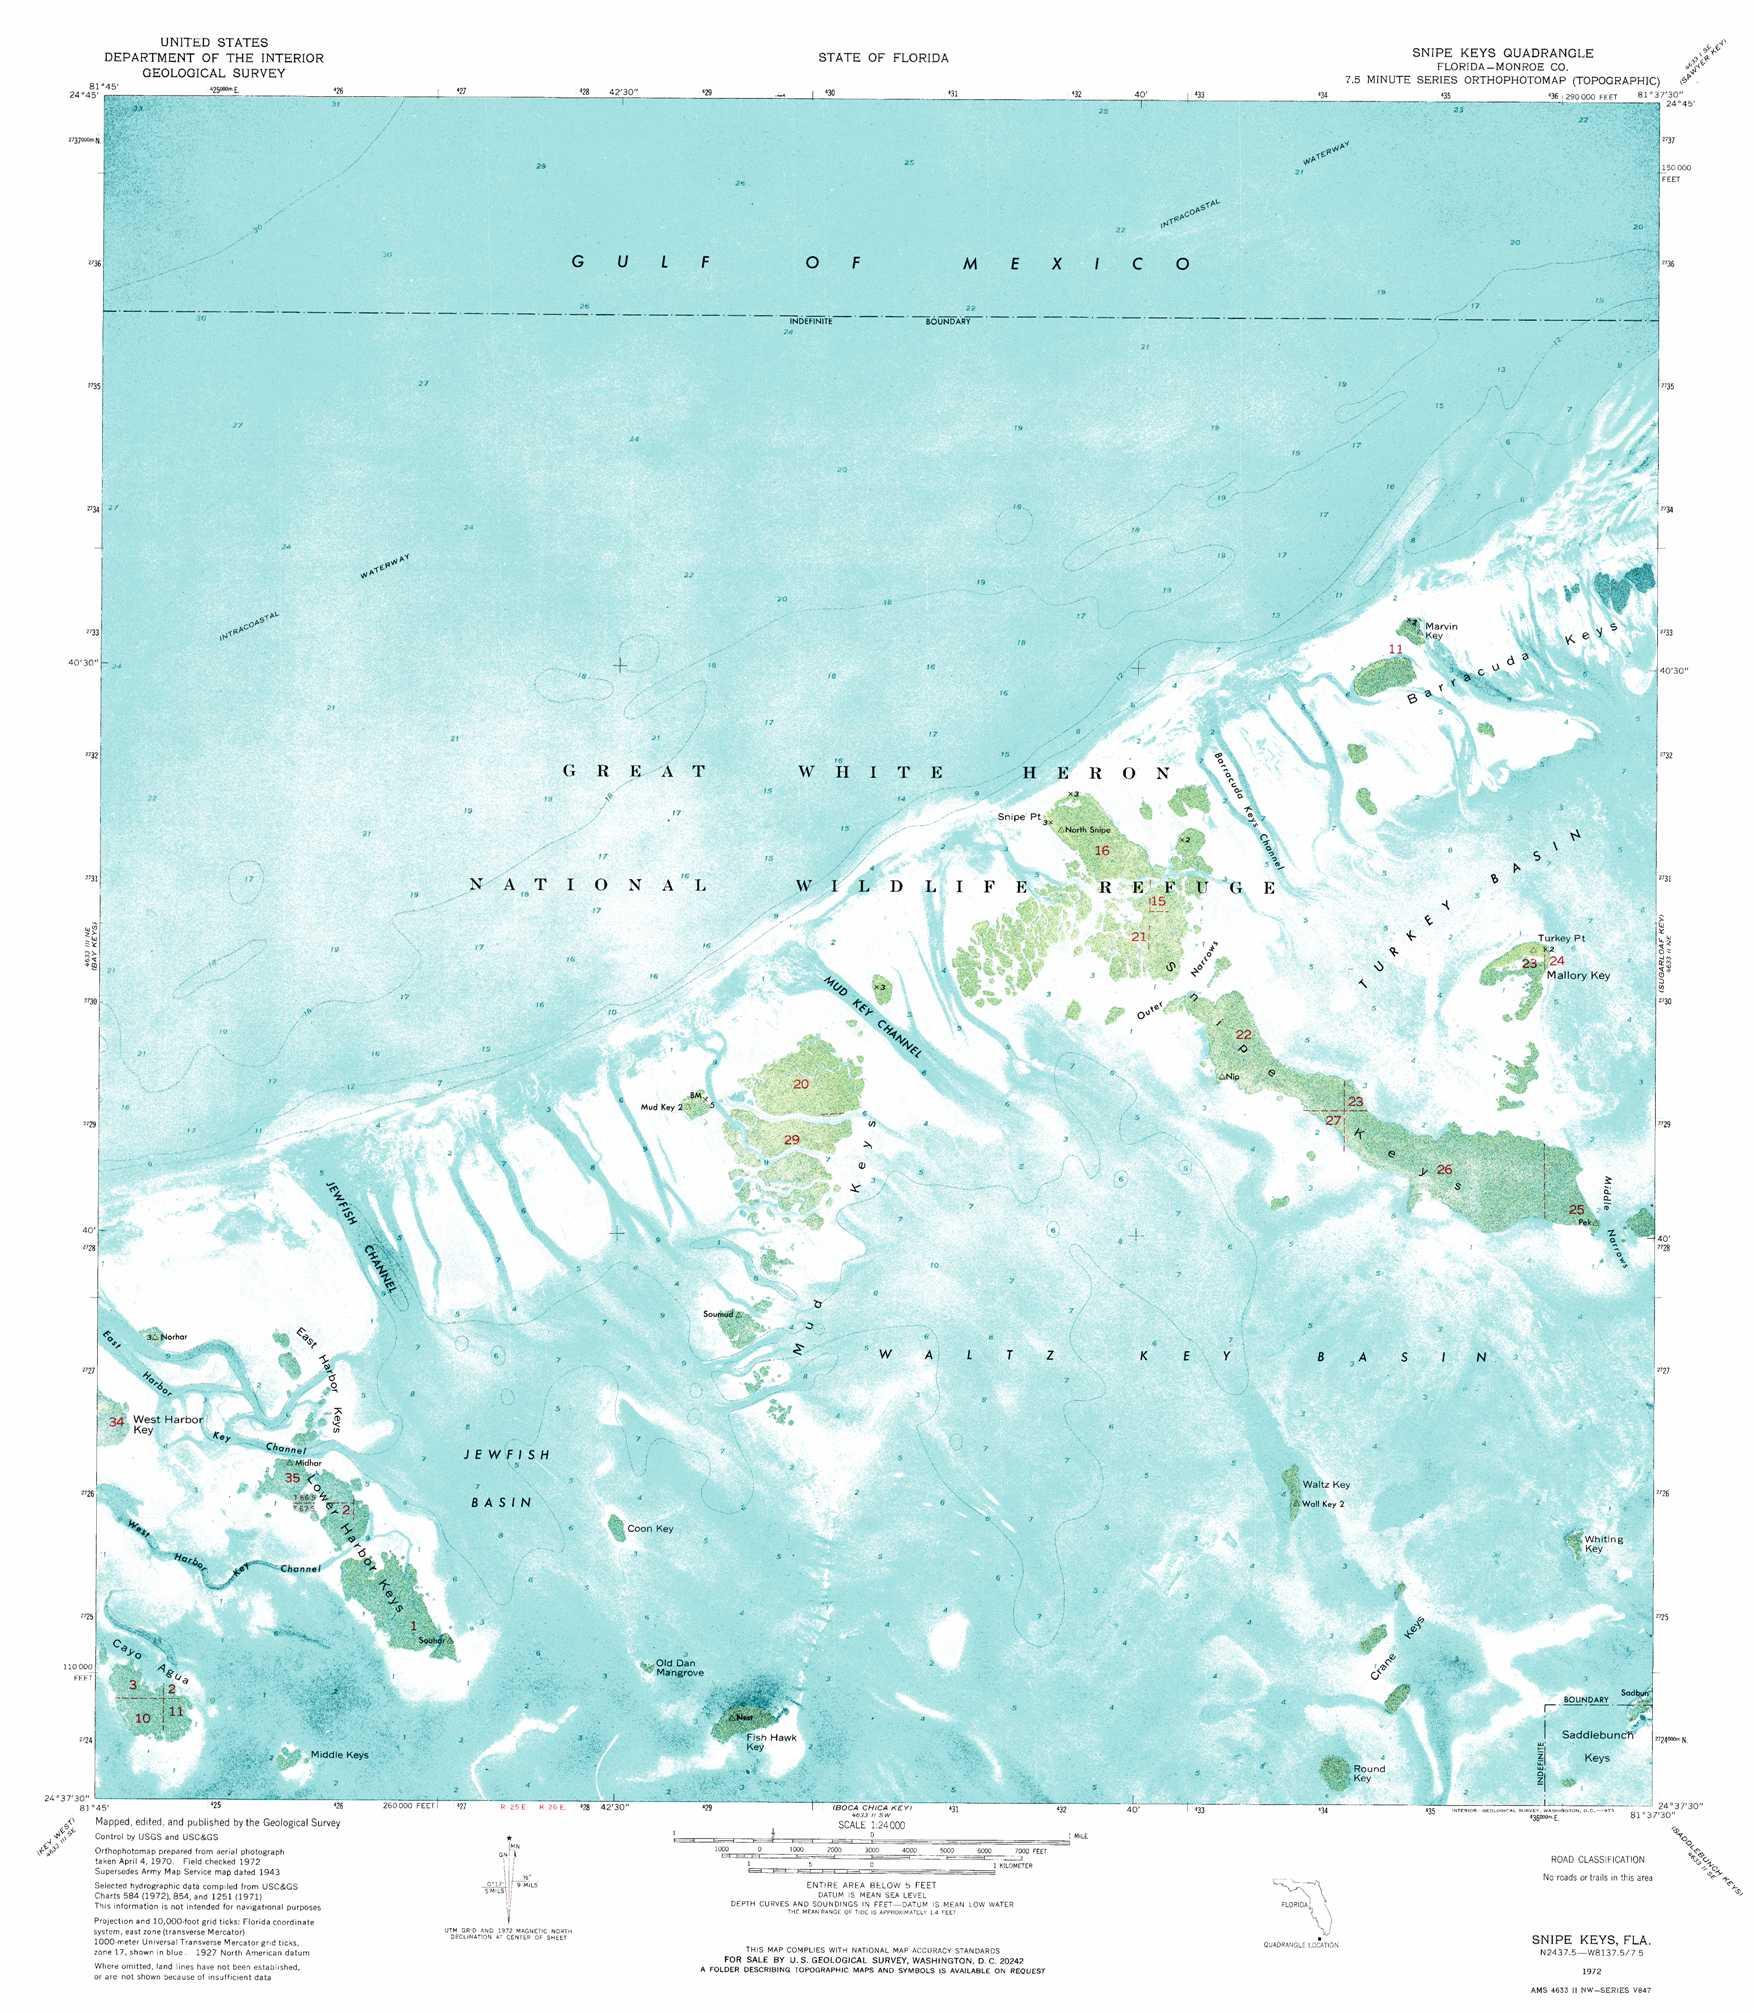 Snipe Keys Topographic Map Fl Usgs Topo Quad 24081f6